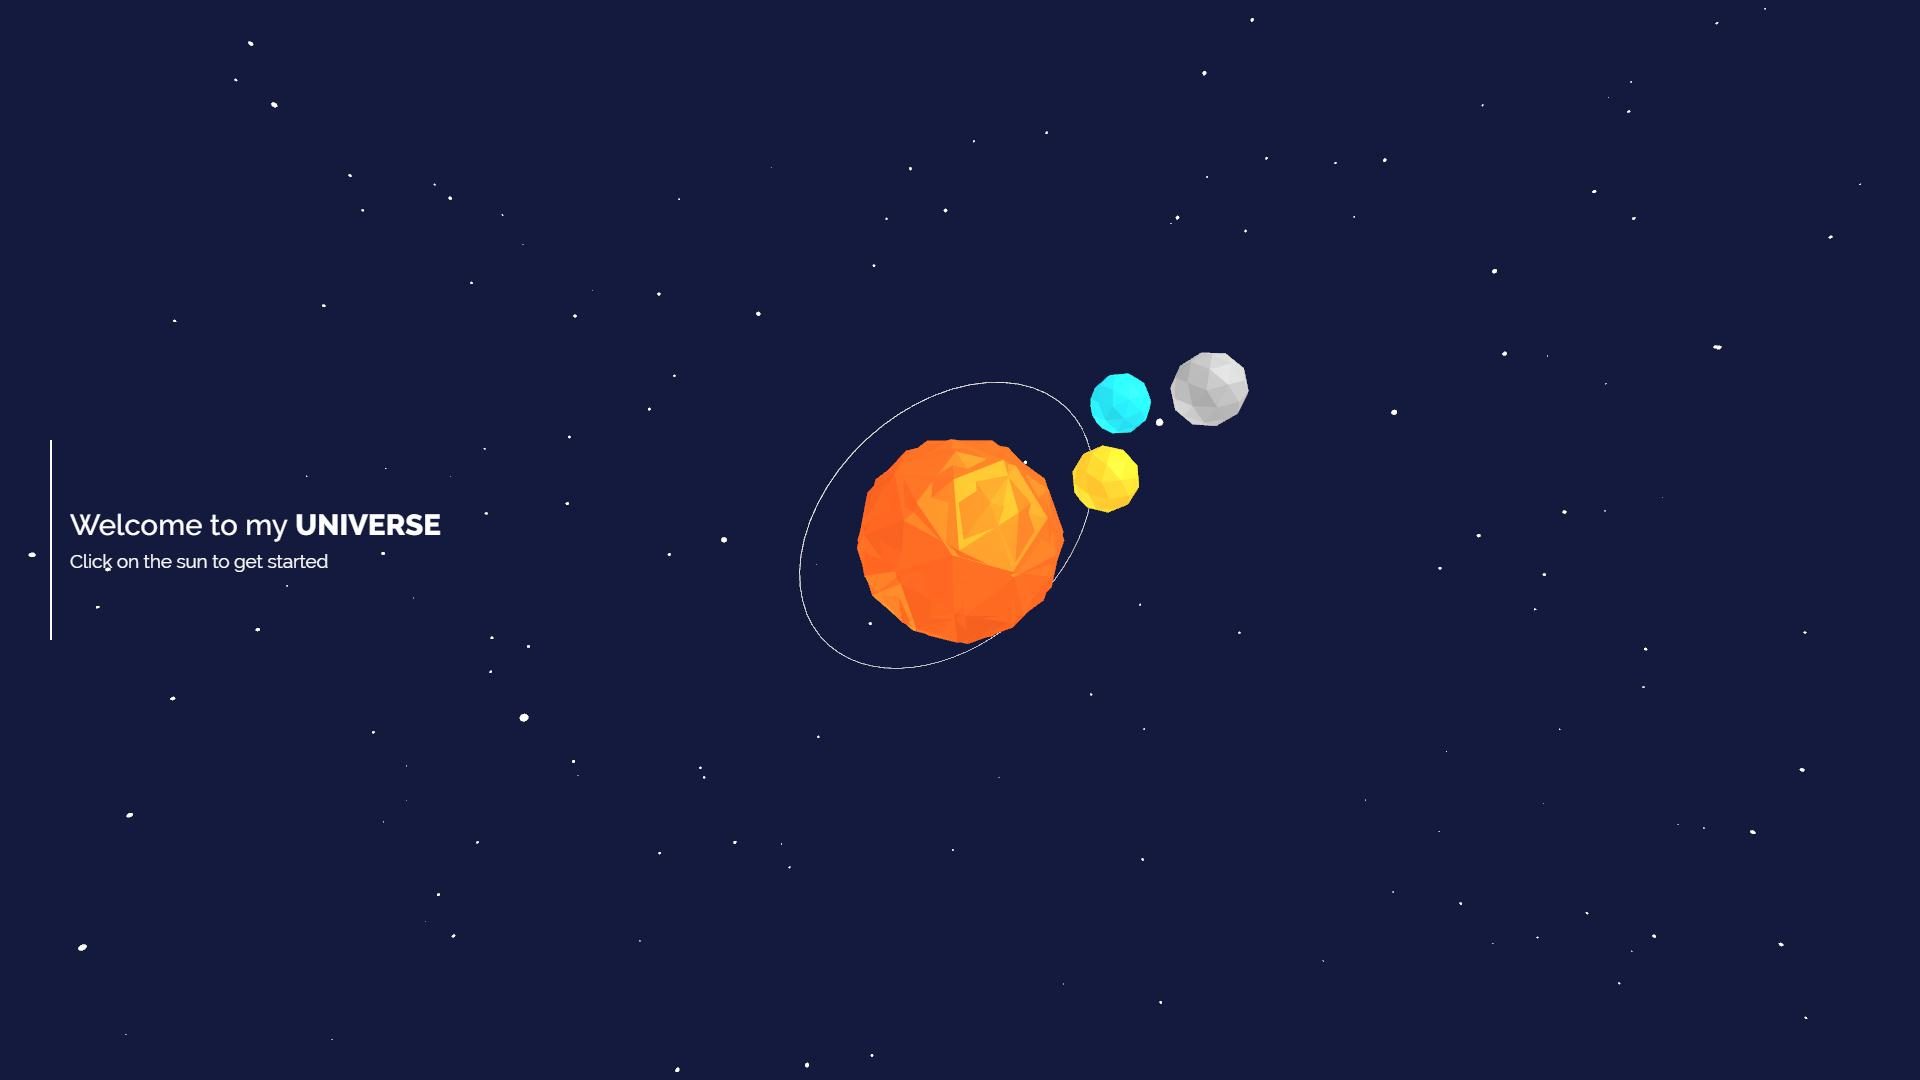 solar system js - photo #35